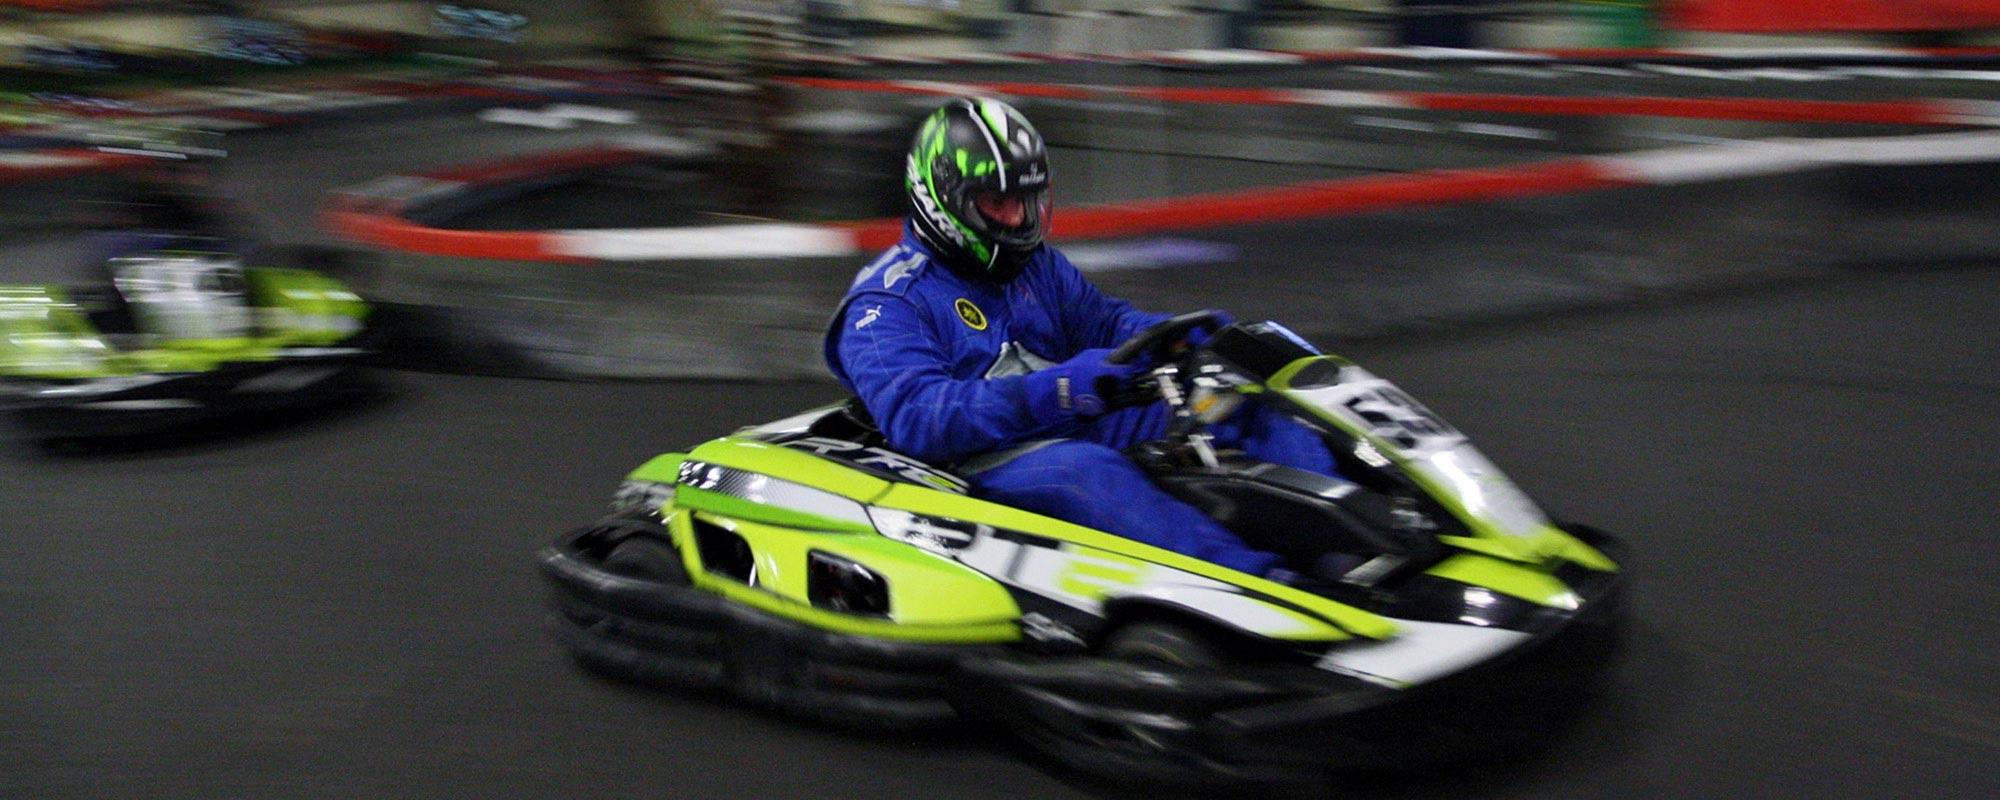 ebafkc-karting-2000x800-01